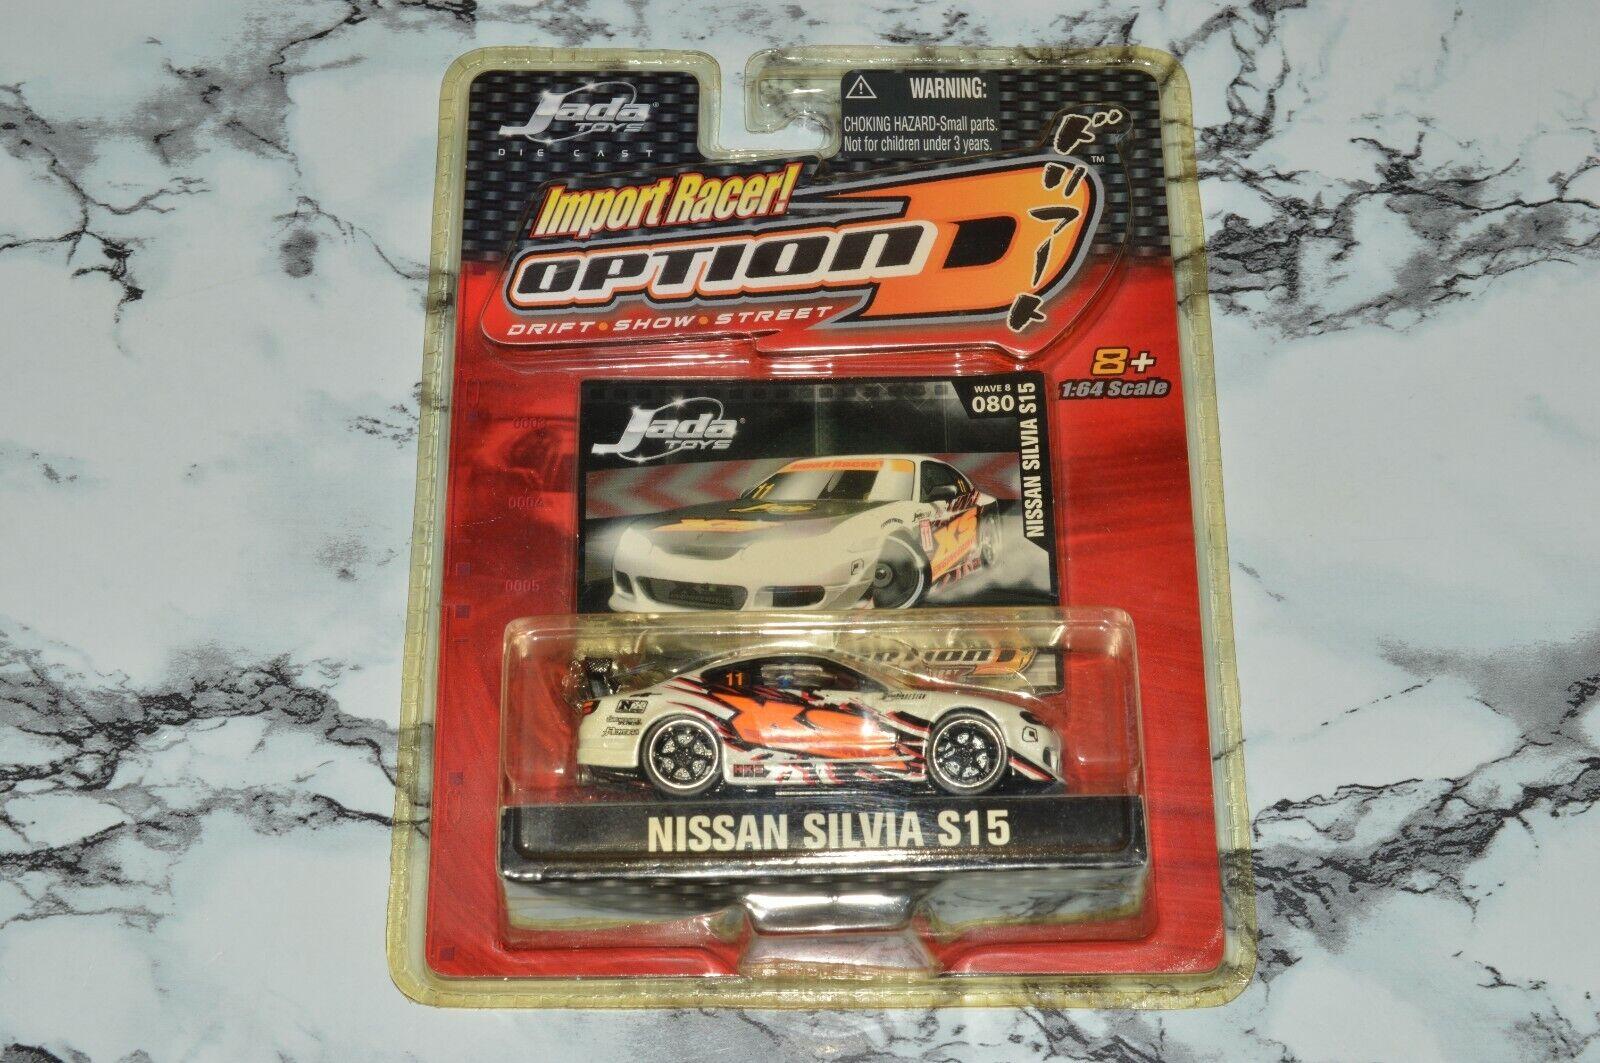 Rare Extreme Tuner Nissan Silvia S 15 Die Cast 1 12 For Sale Online Ebay